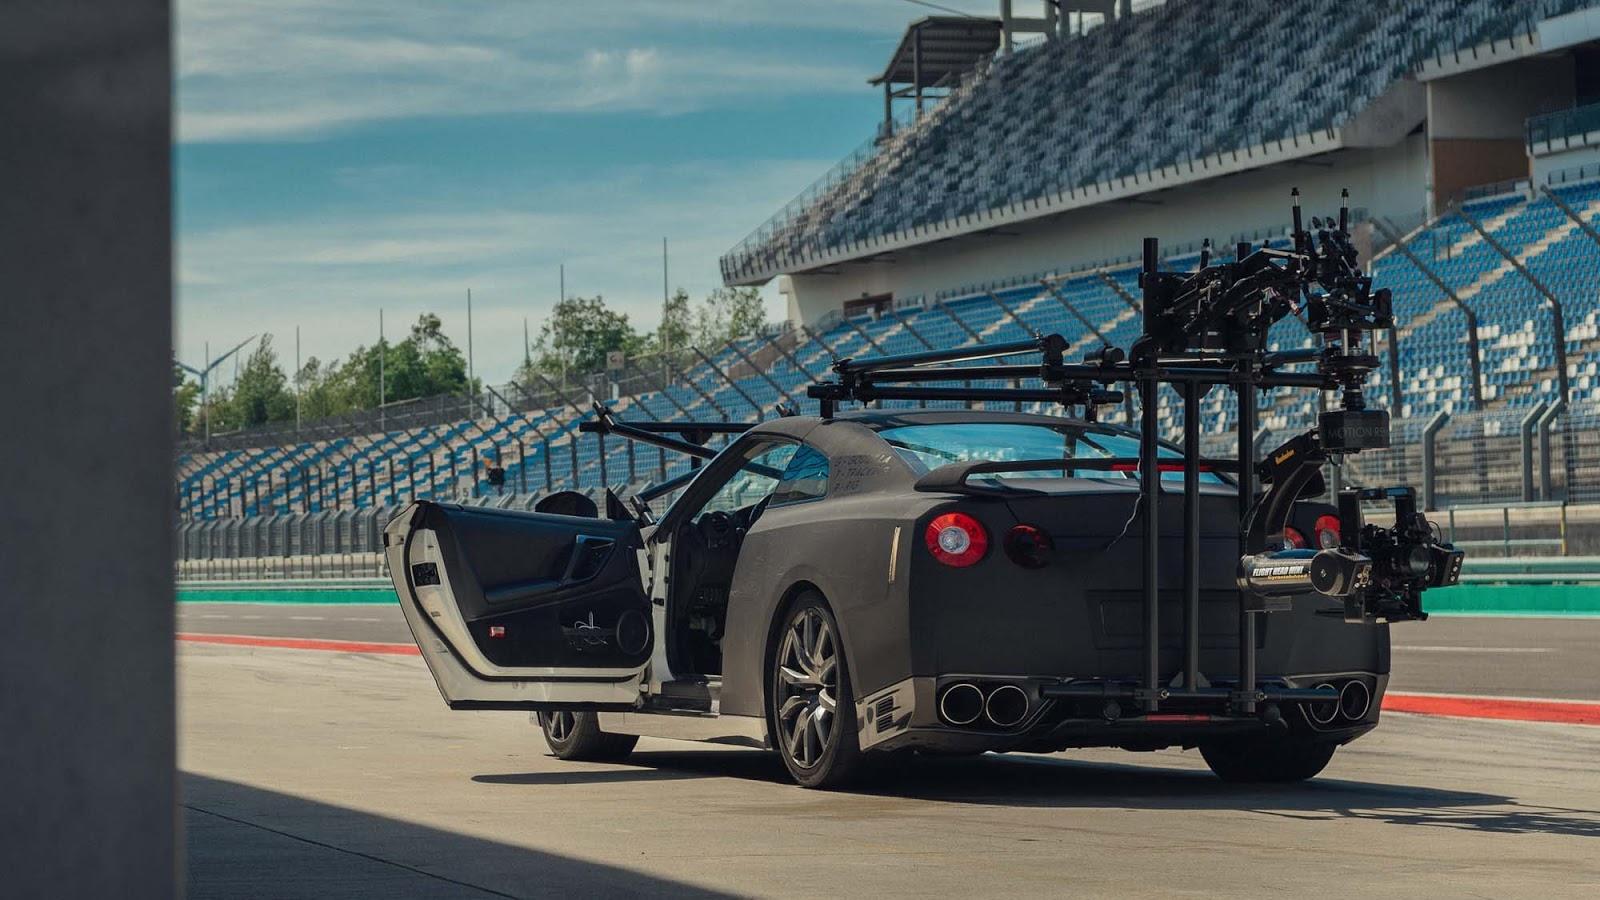 GT R NISMO Berlin Test Drive 1 Πώς μπορείς να κινηματογραφήσεις τον Godzilla Godzilla, GTR, Nismo, Nismo GT-R, Nissan, Nissan GT-R NISMO, video, videos, zblog, ΦΩΤΟ, φωτογραφίες